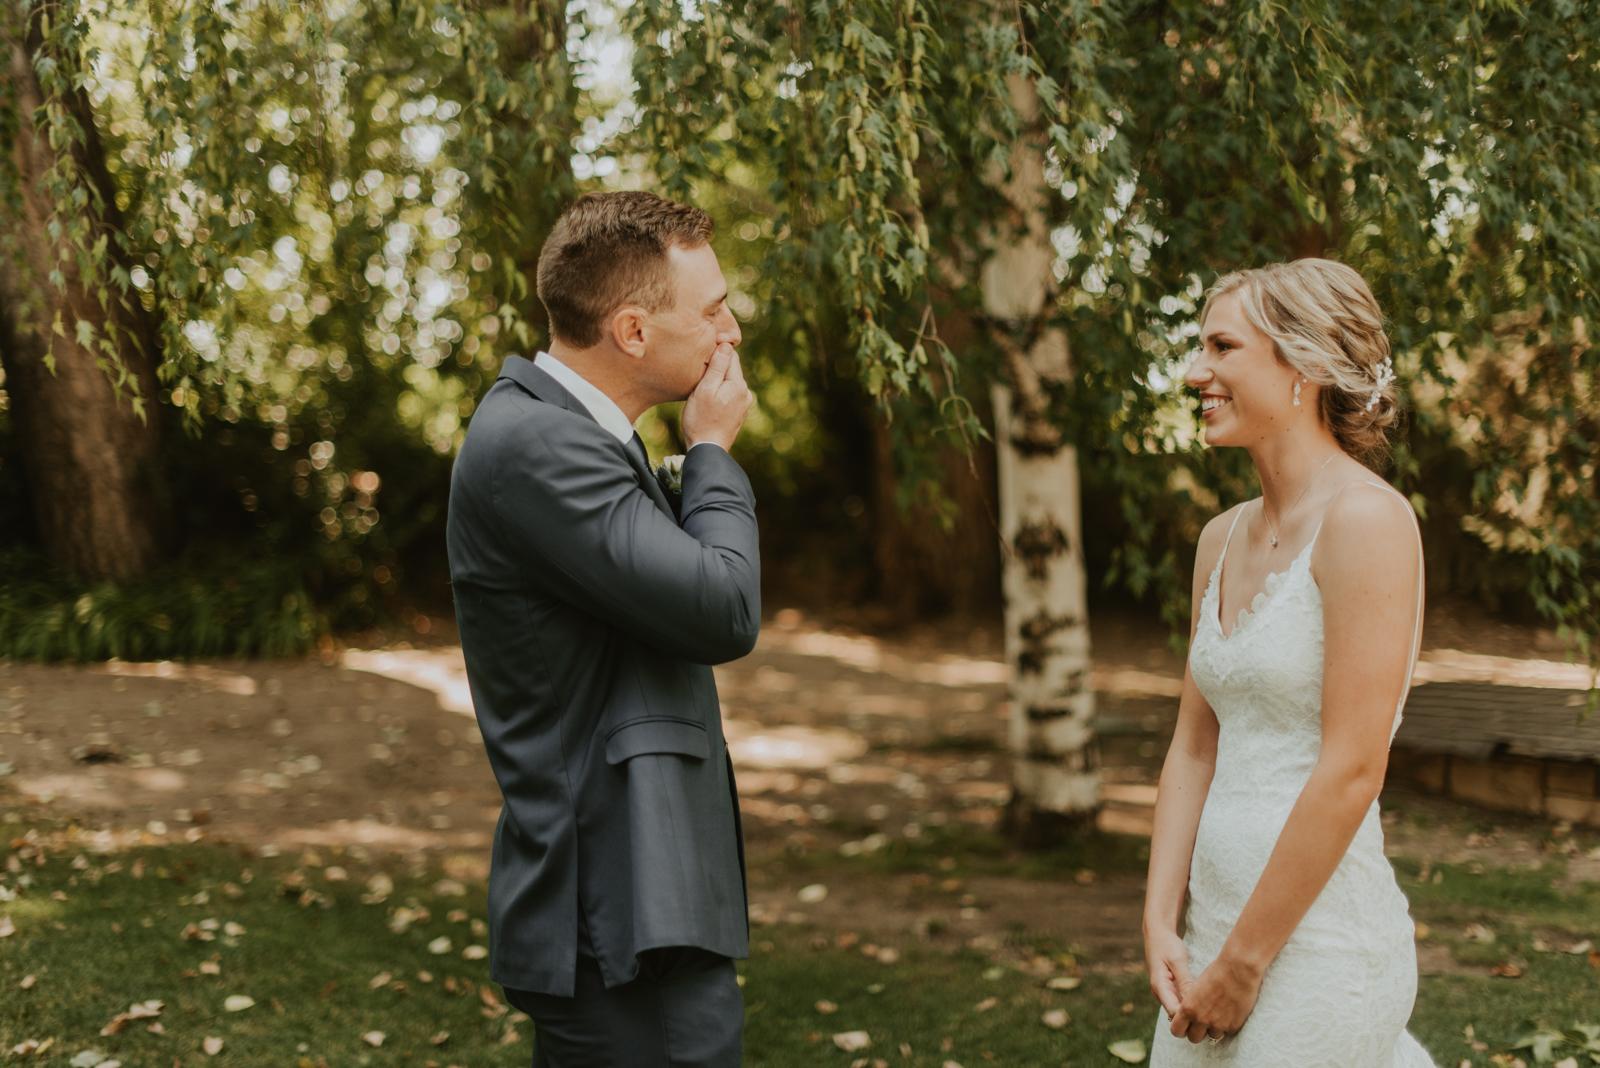 Bride + groom, Savannah + Hank's, first look photo at the Tapestry House by Wedgewood Weddings in Fort Collins, Colorado.